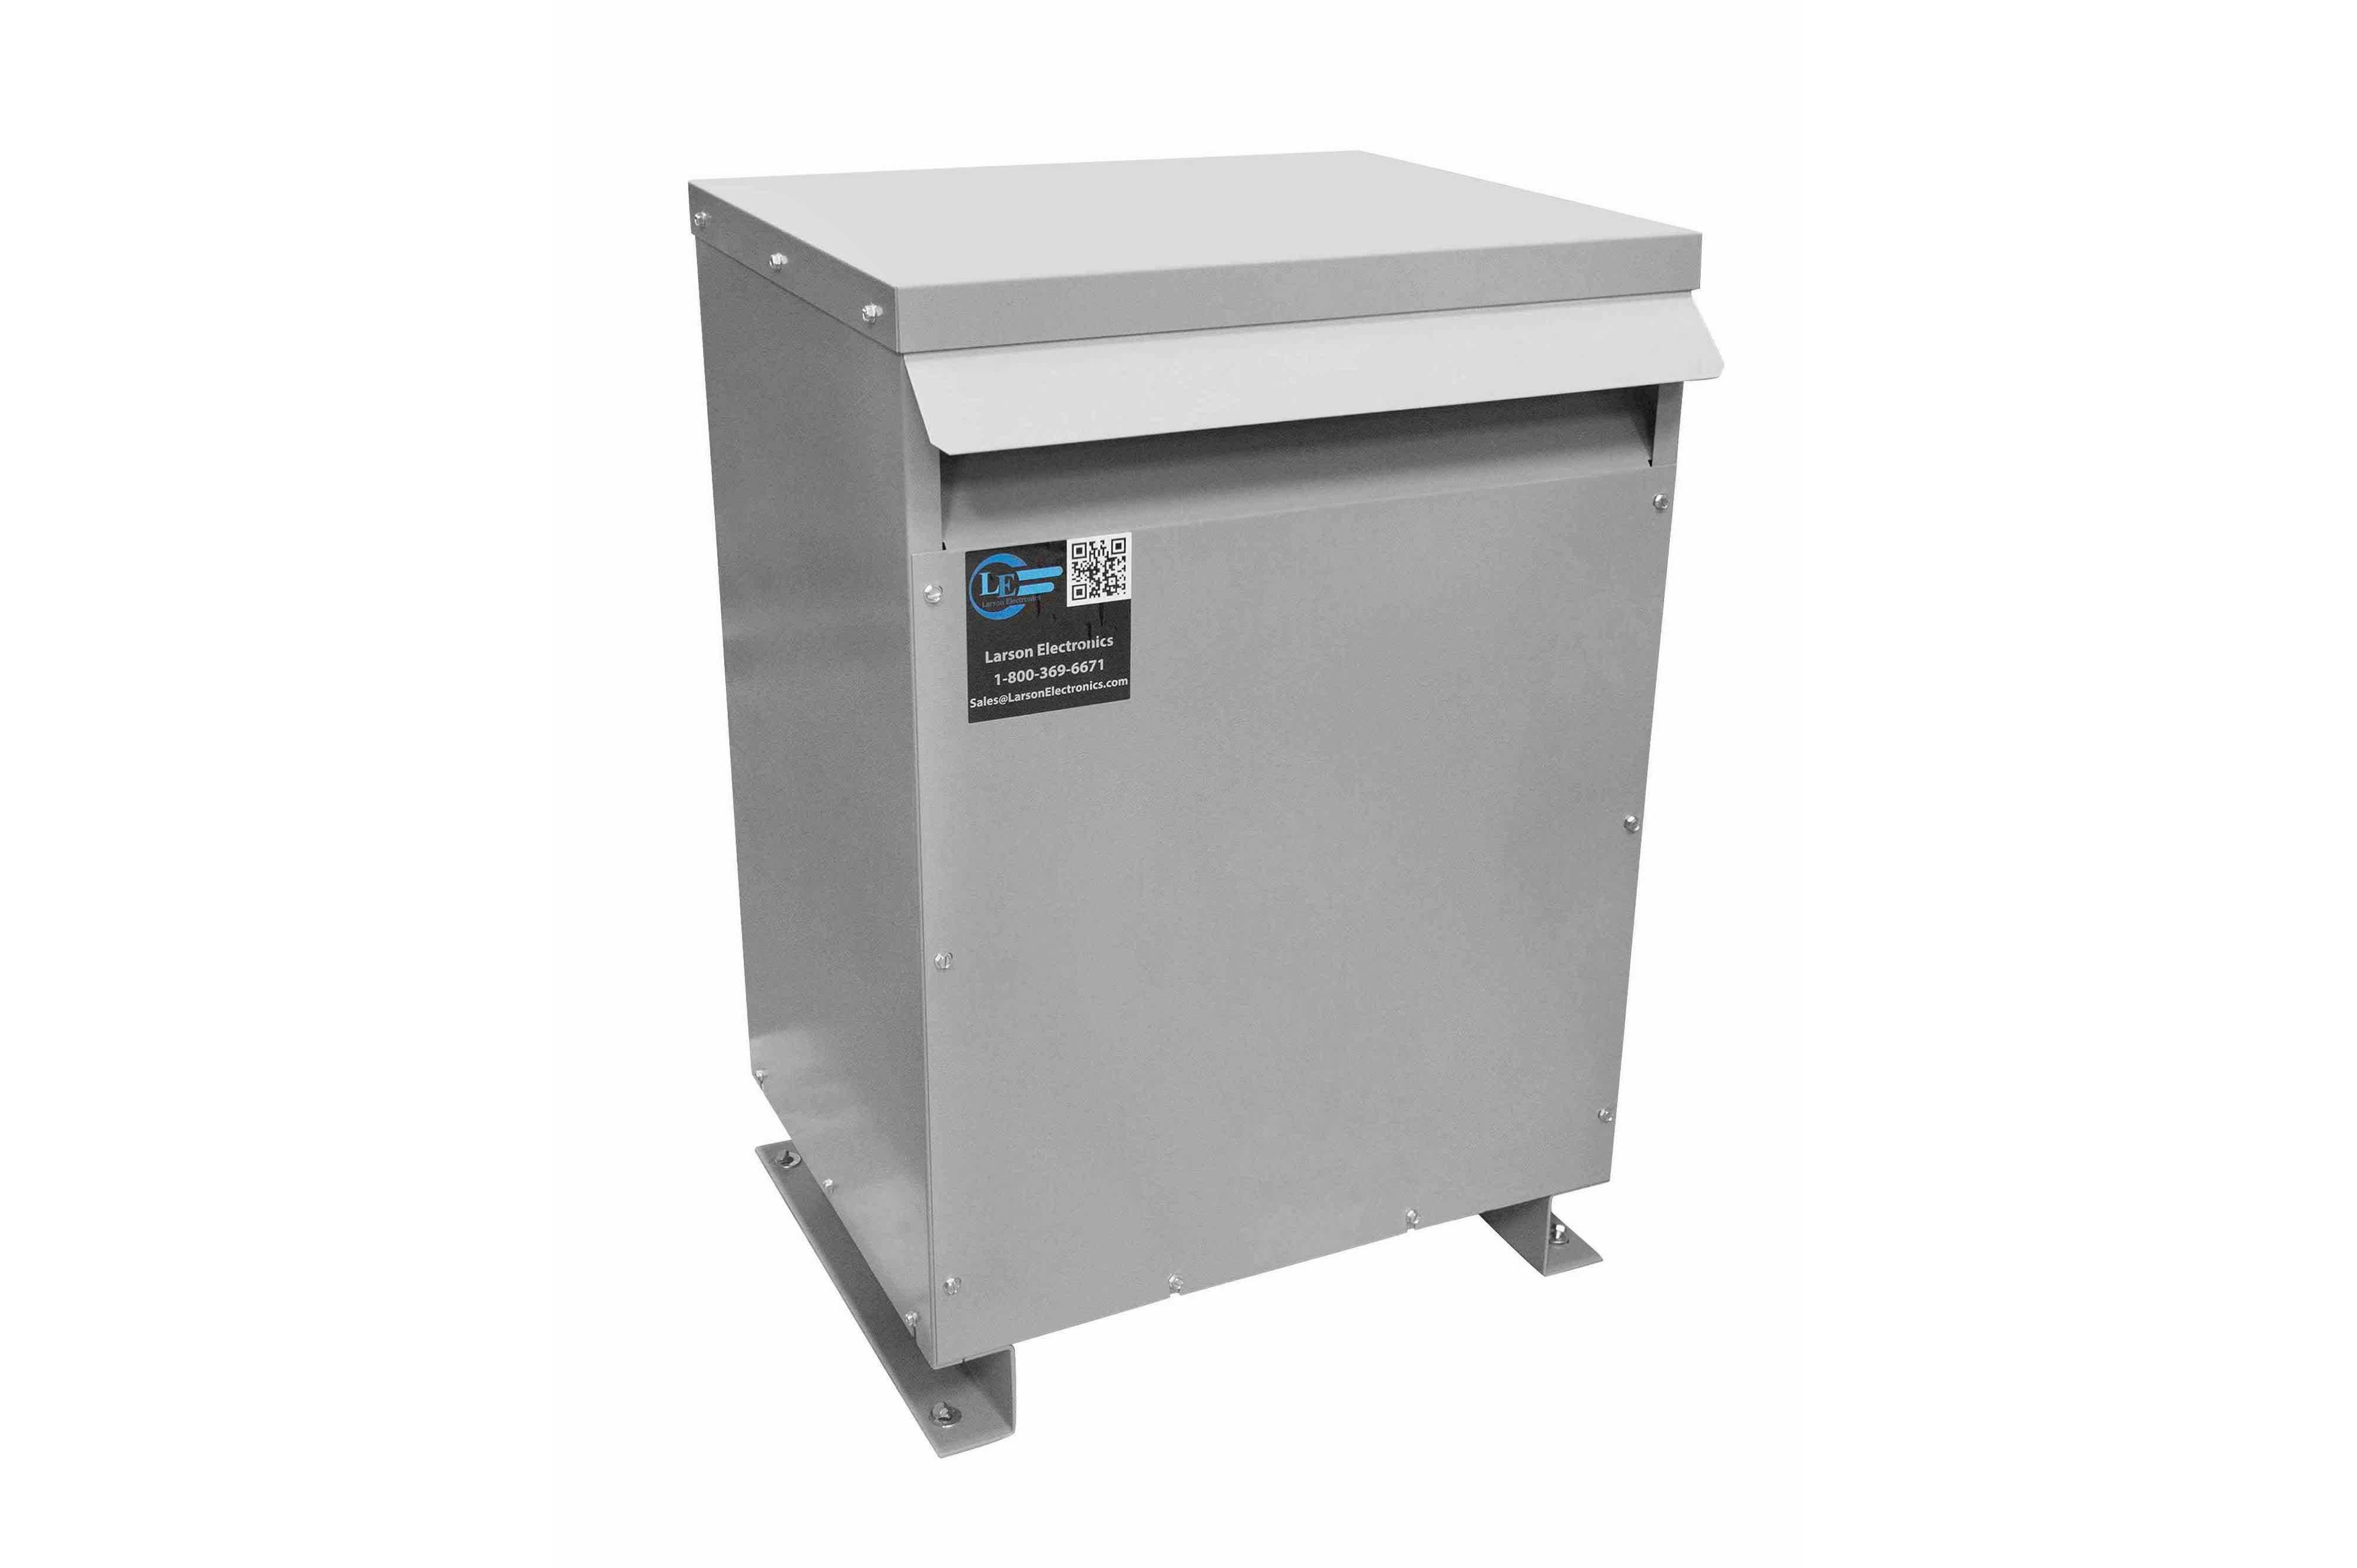 22.5 kVA 3PH Isolation Transformer, 240V Wye Primary, 400V Delta Secondary, N3R, Ventilated, 60 Hz